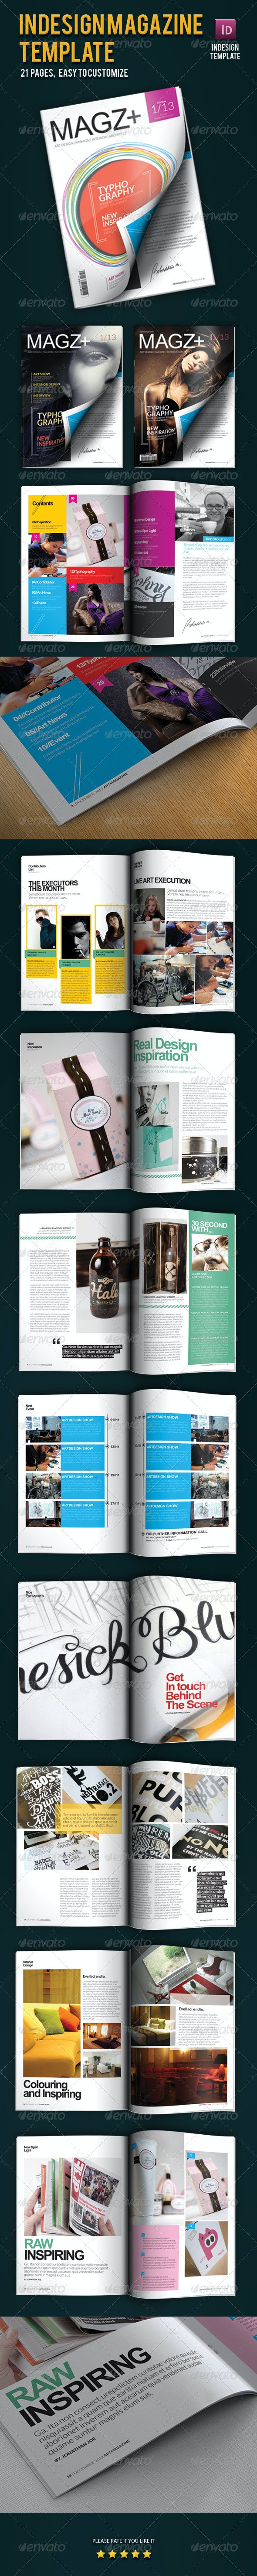 Indesign Magazine Template - Magazines Print Templates